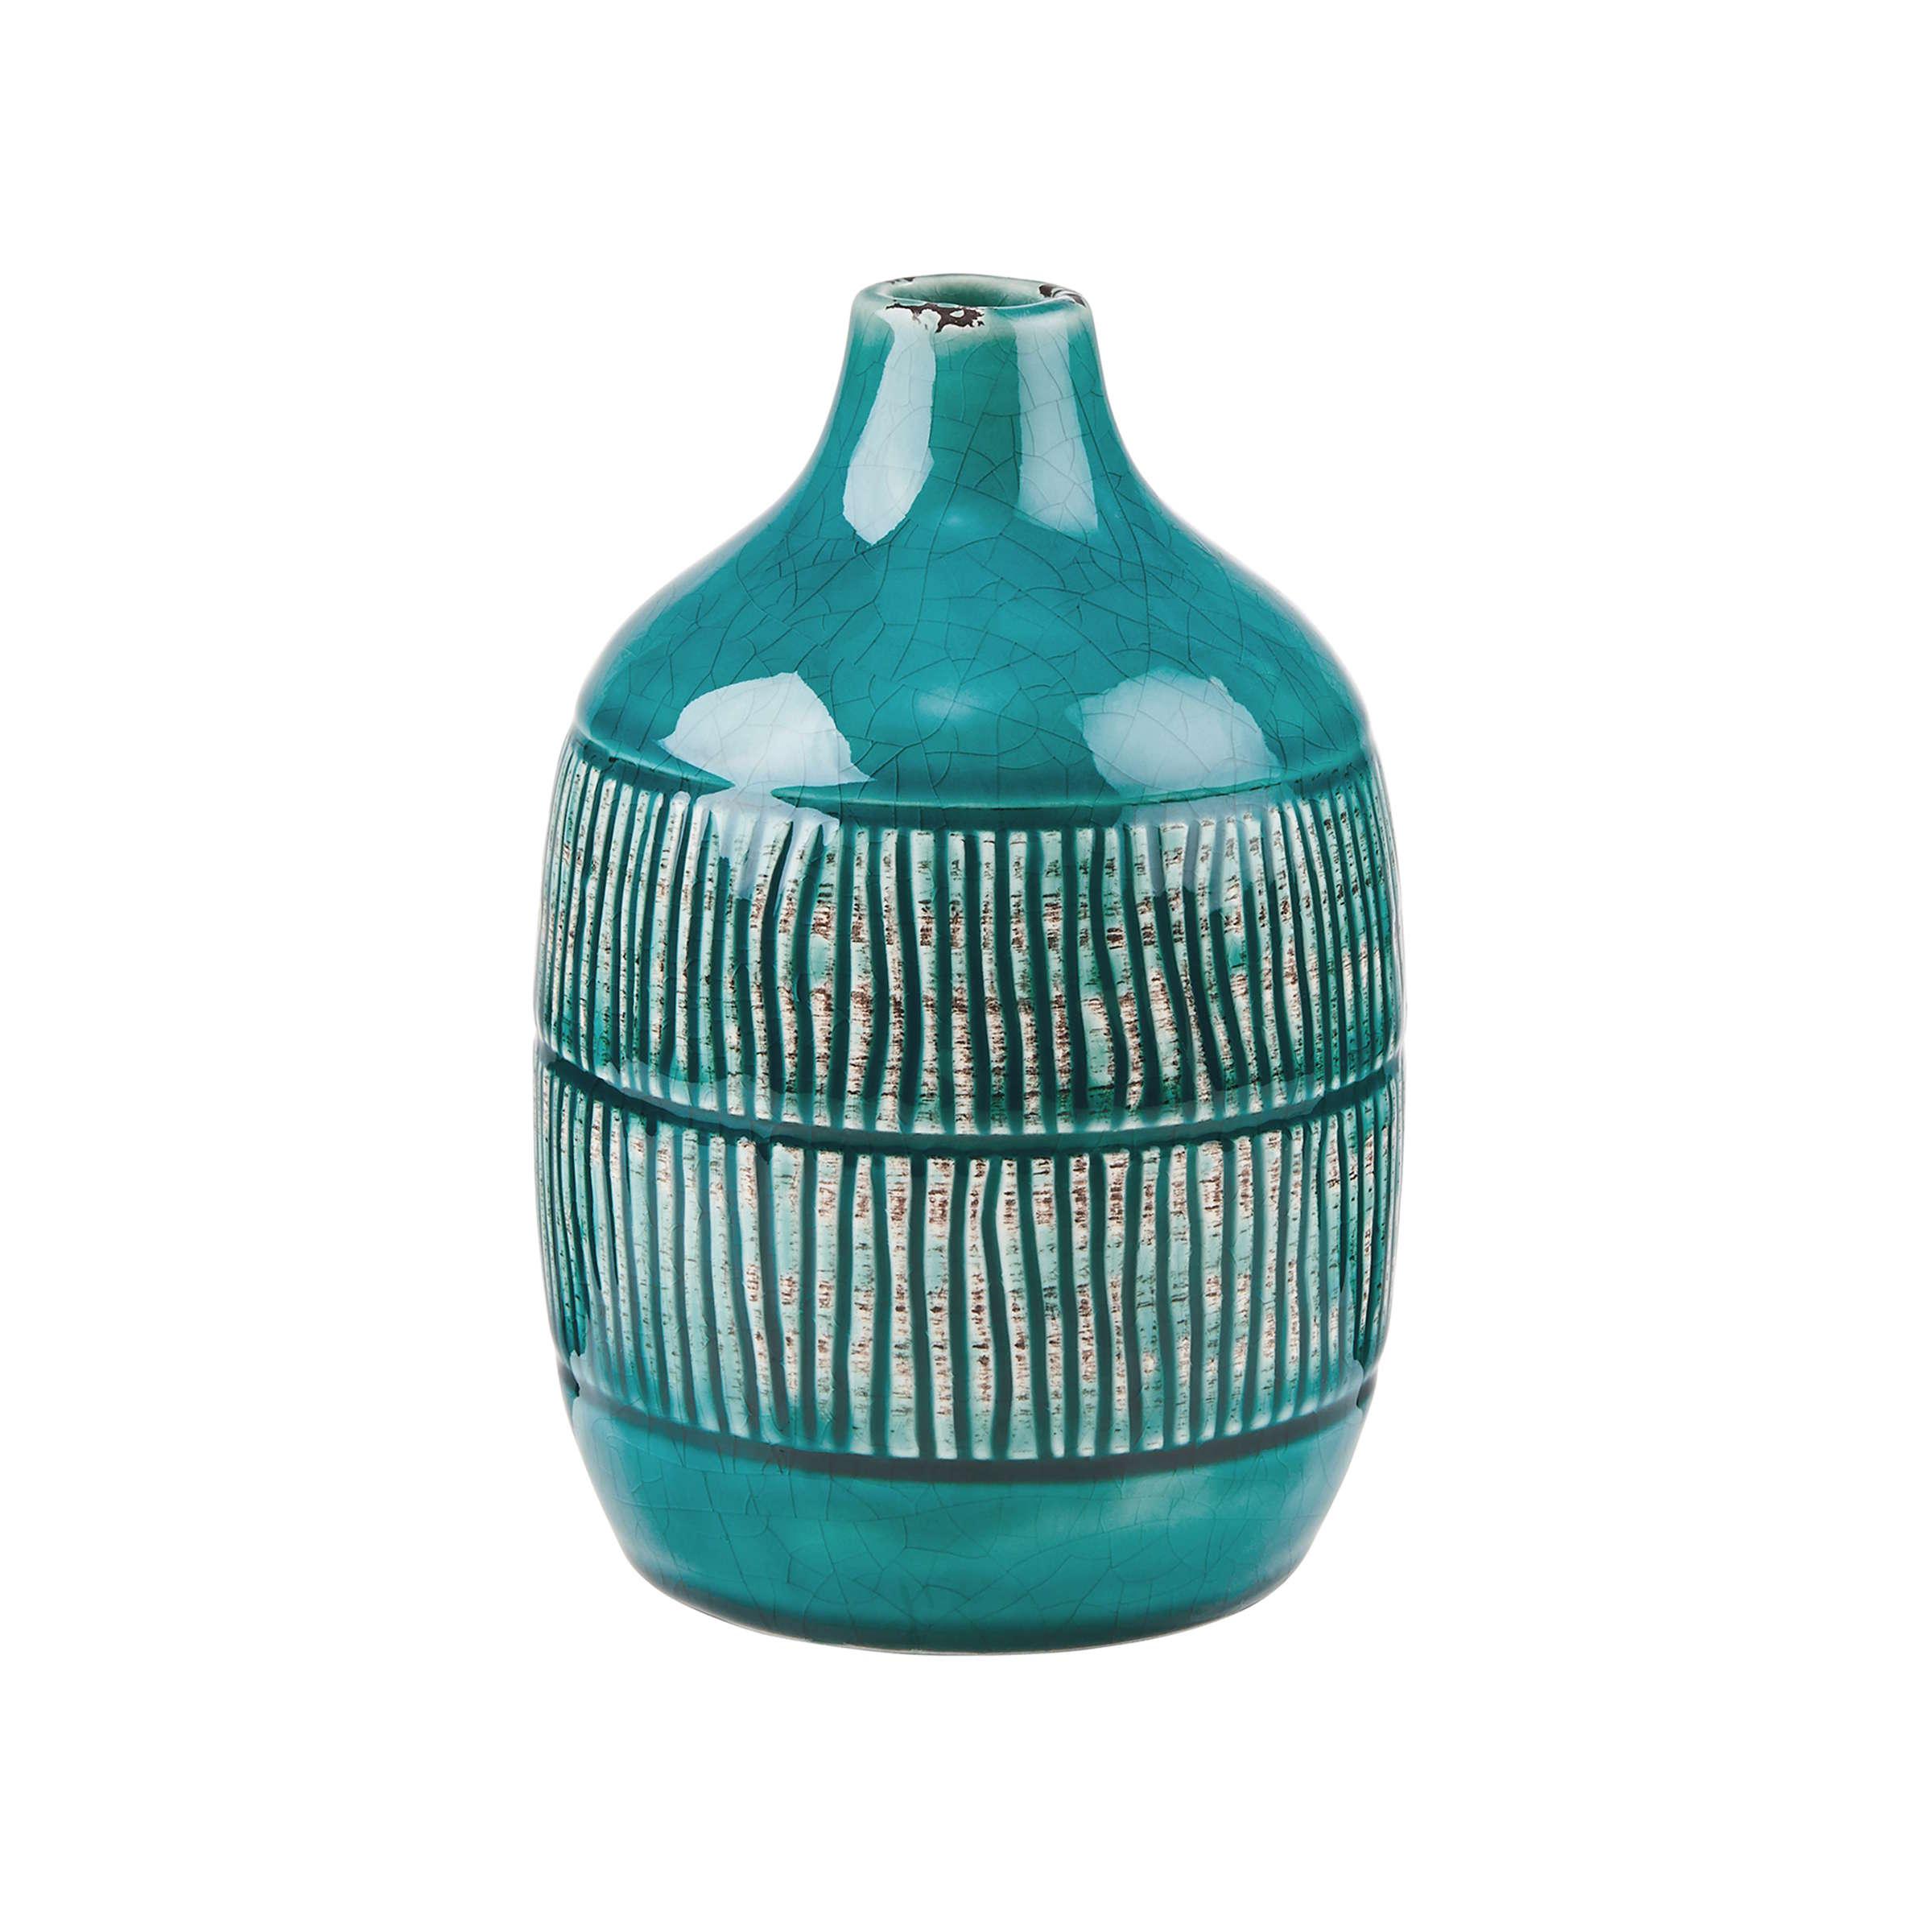 JARRON Vase Streifen 15,6 cm